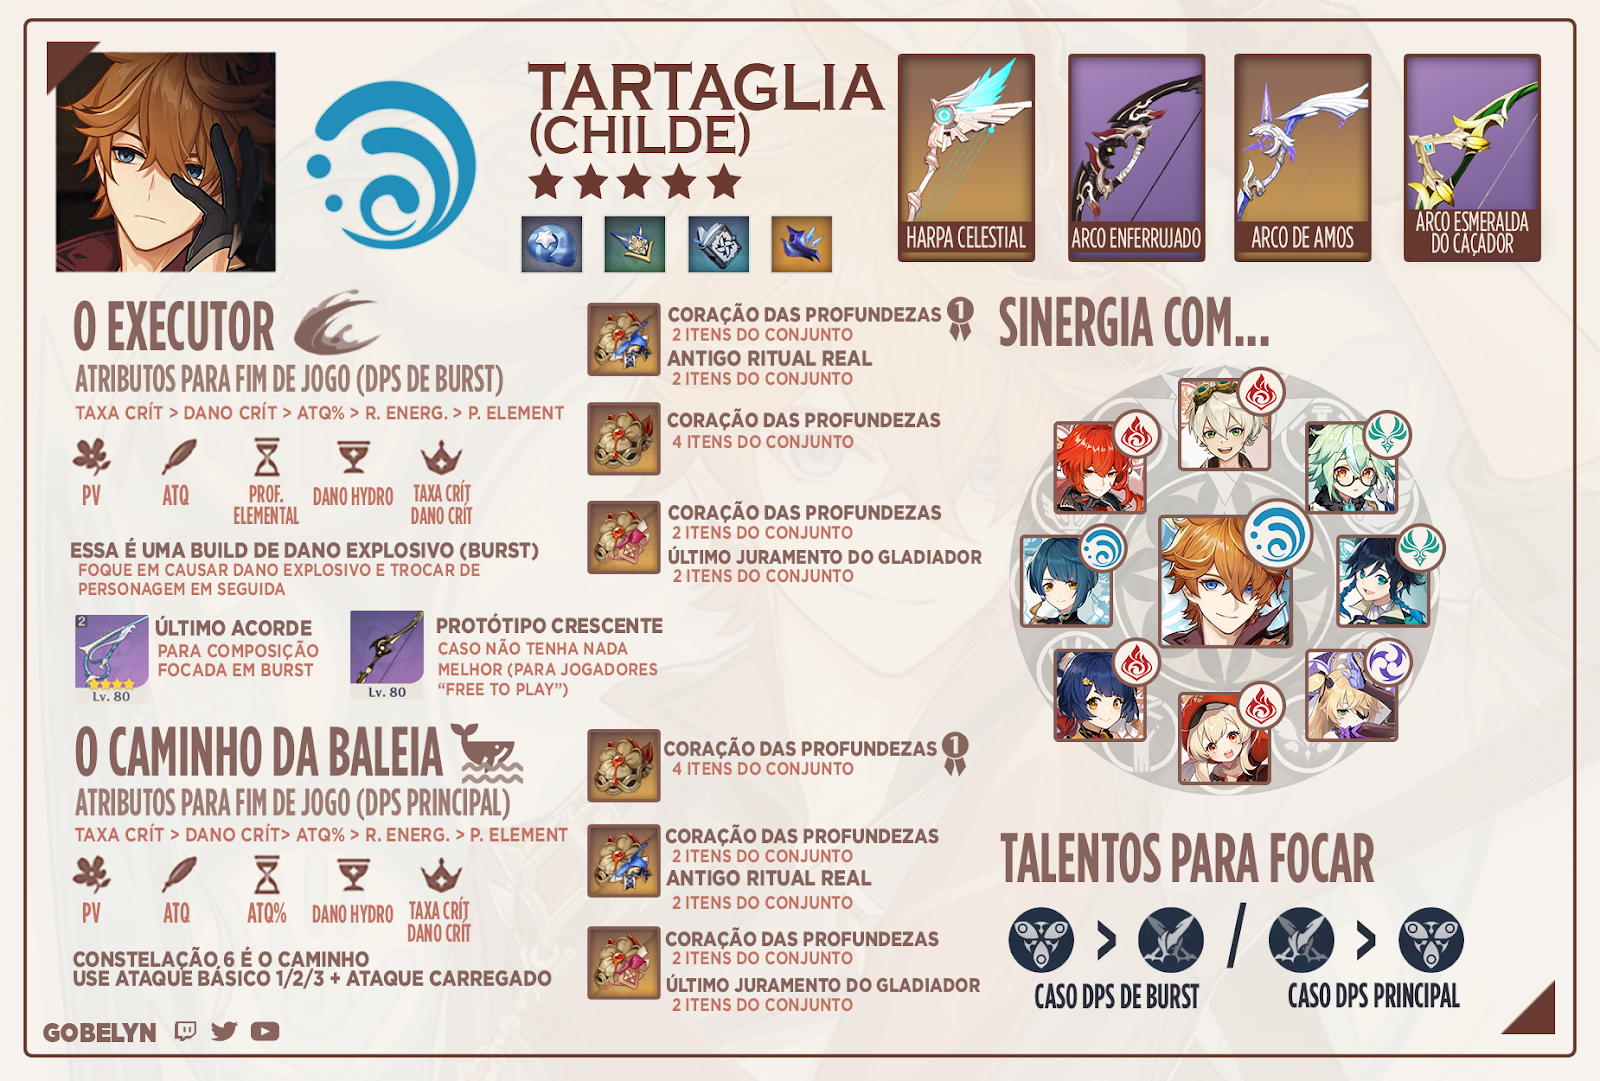 tartaglia (childe) genshin impact gobelyn portugues